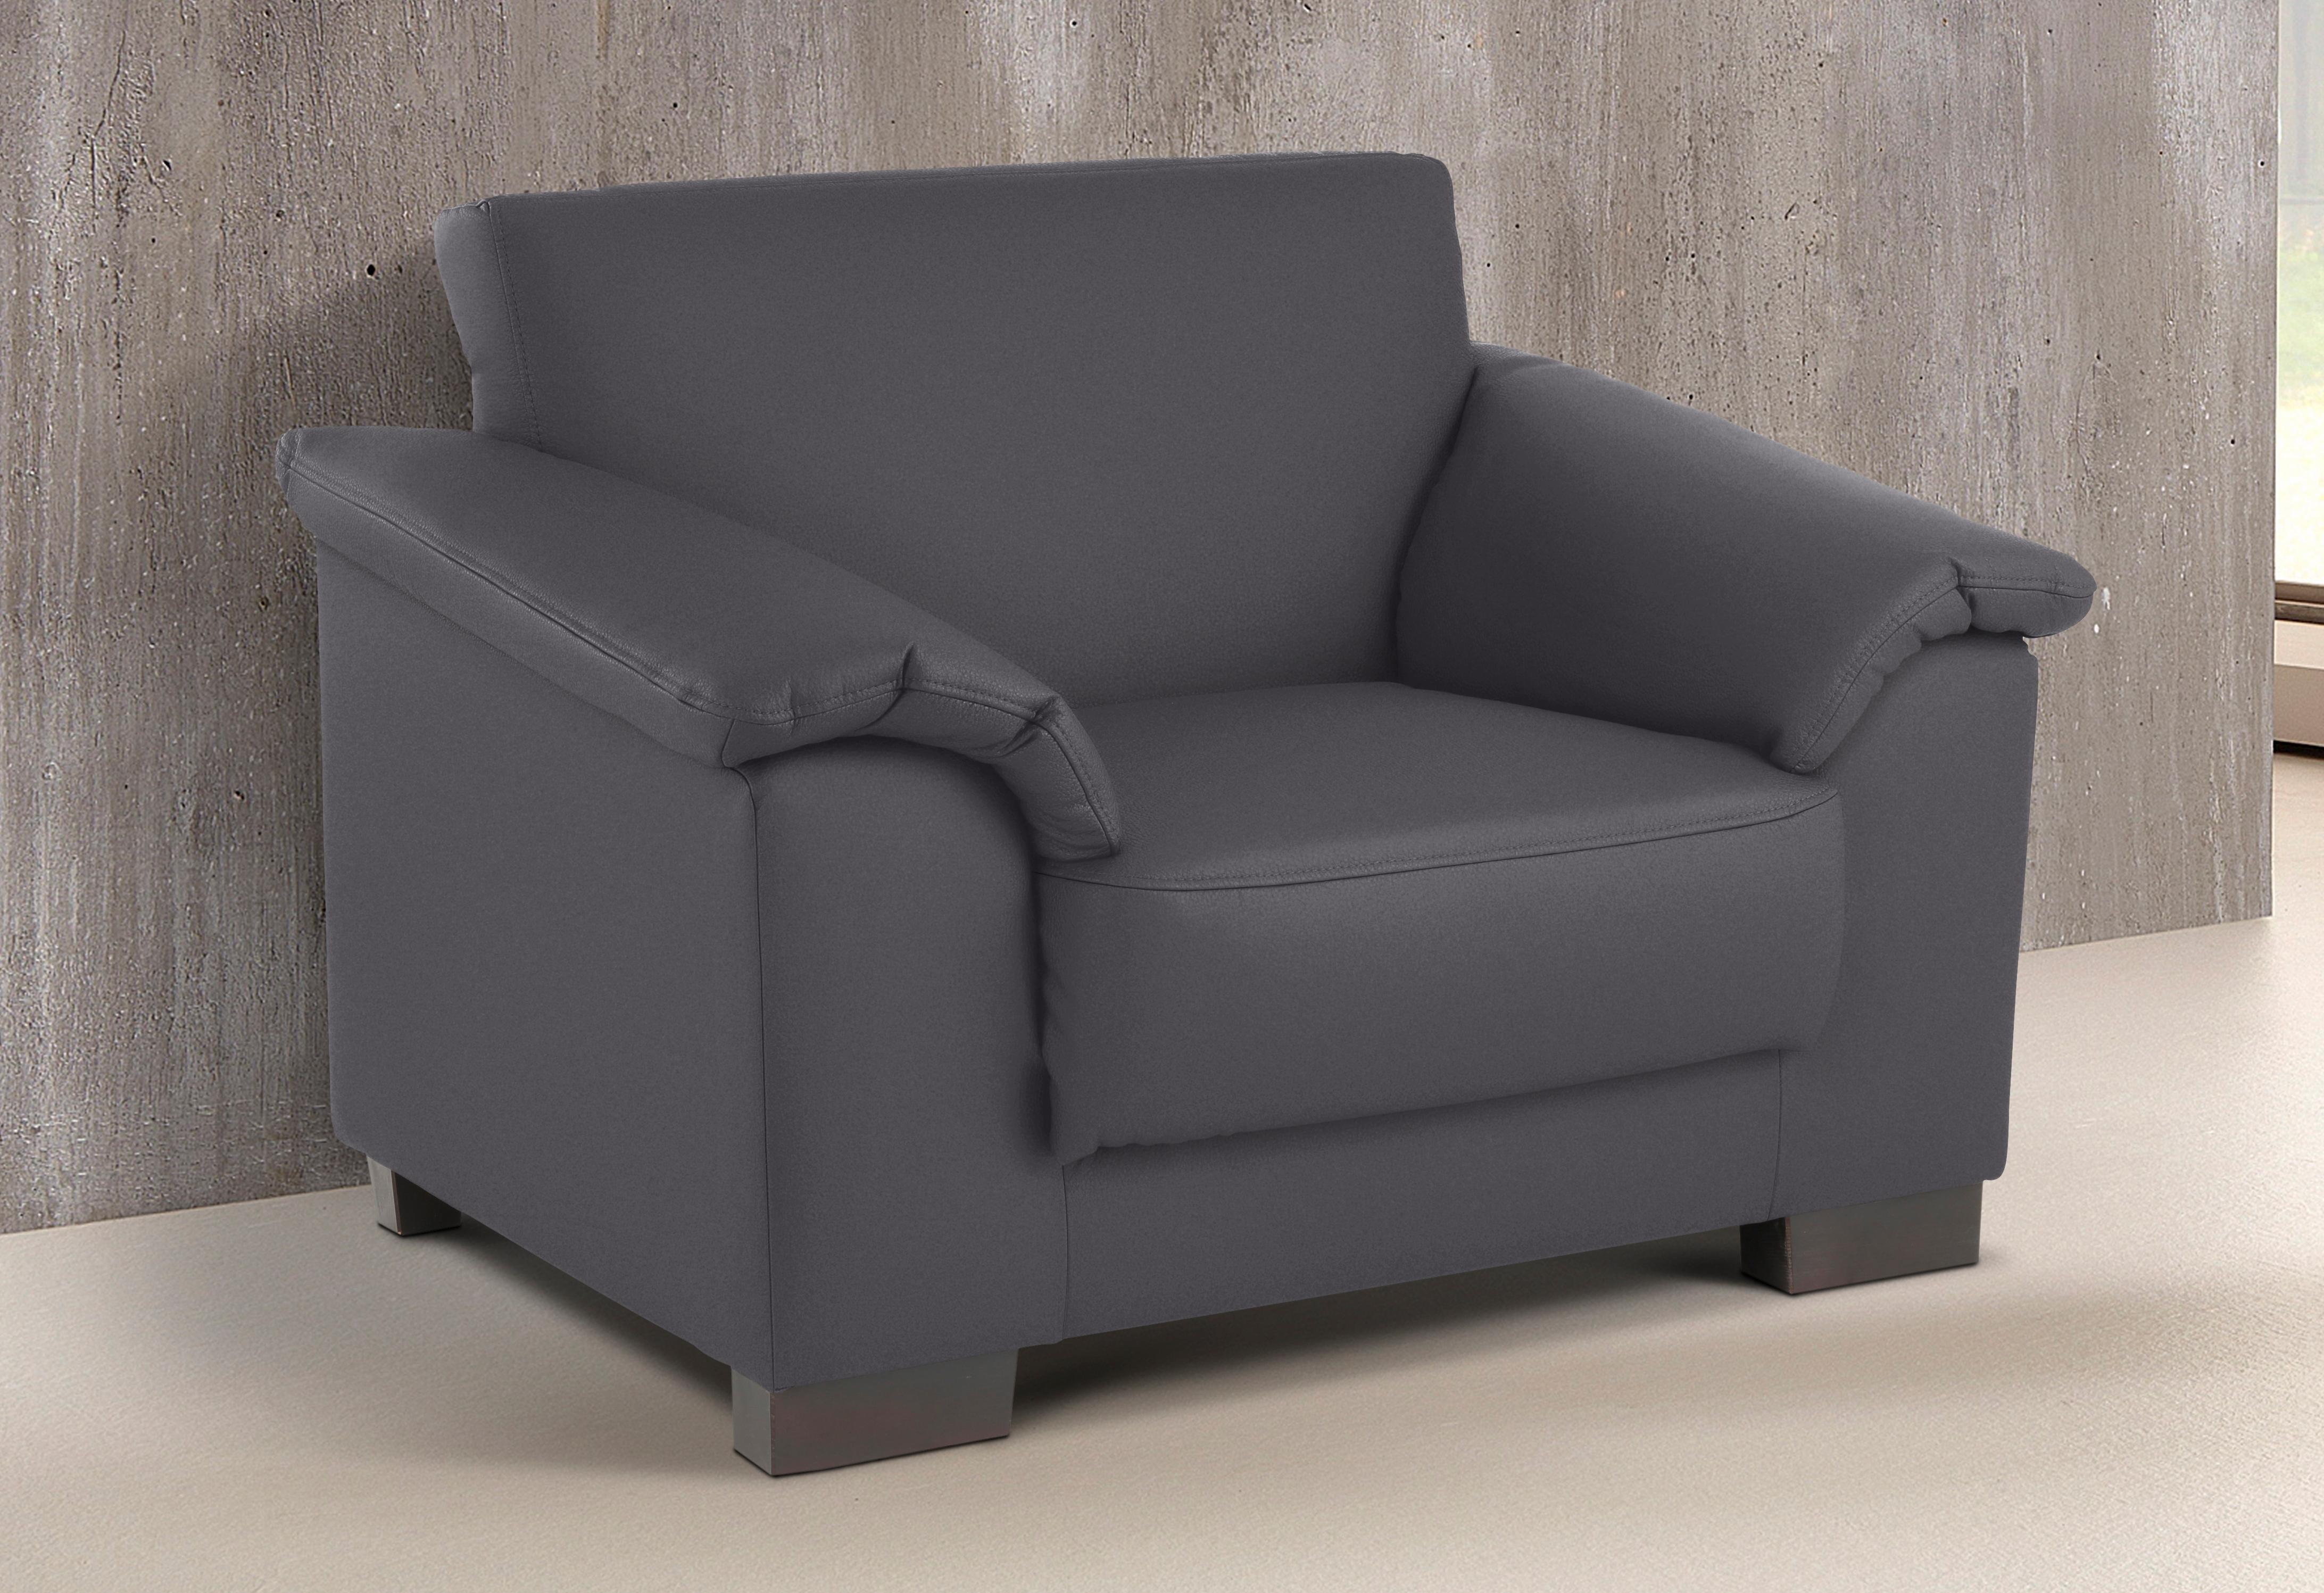 Home affaire fauteuil »Anna« bij OTTO online kopen